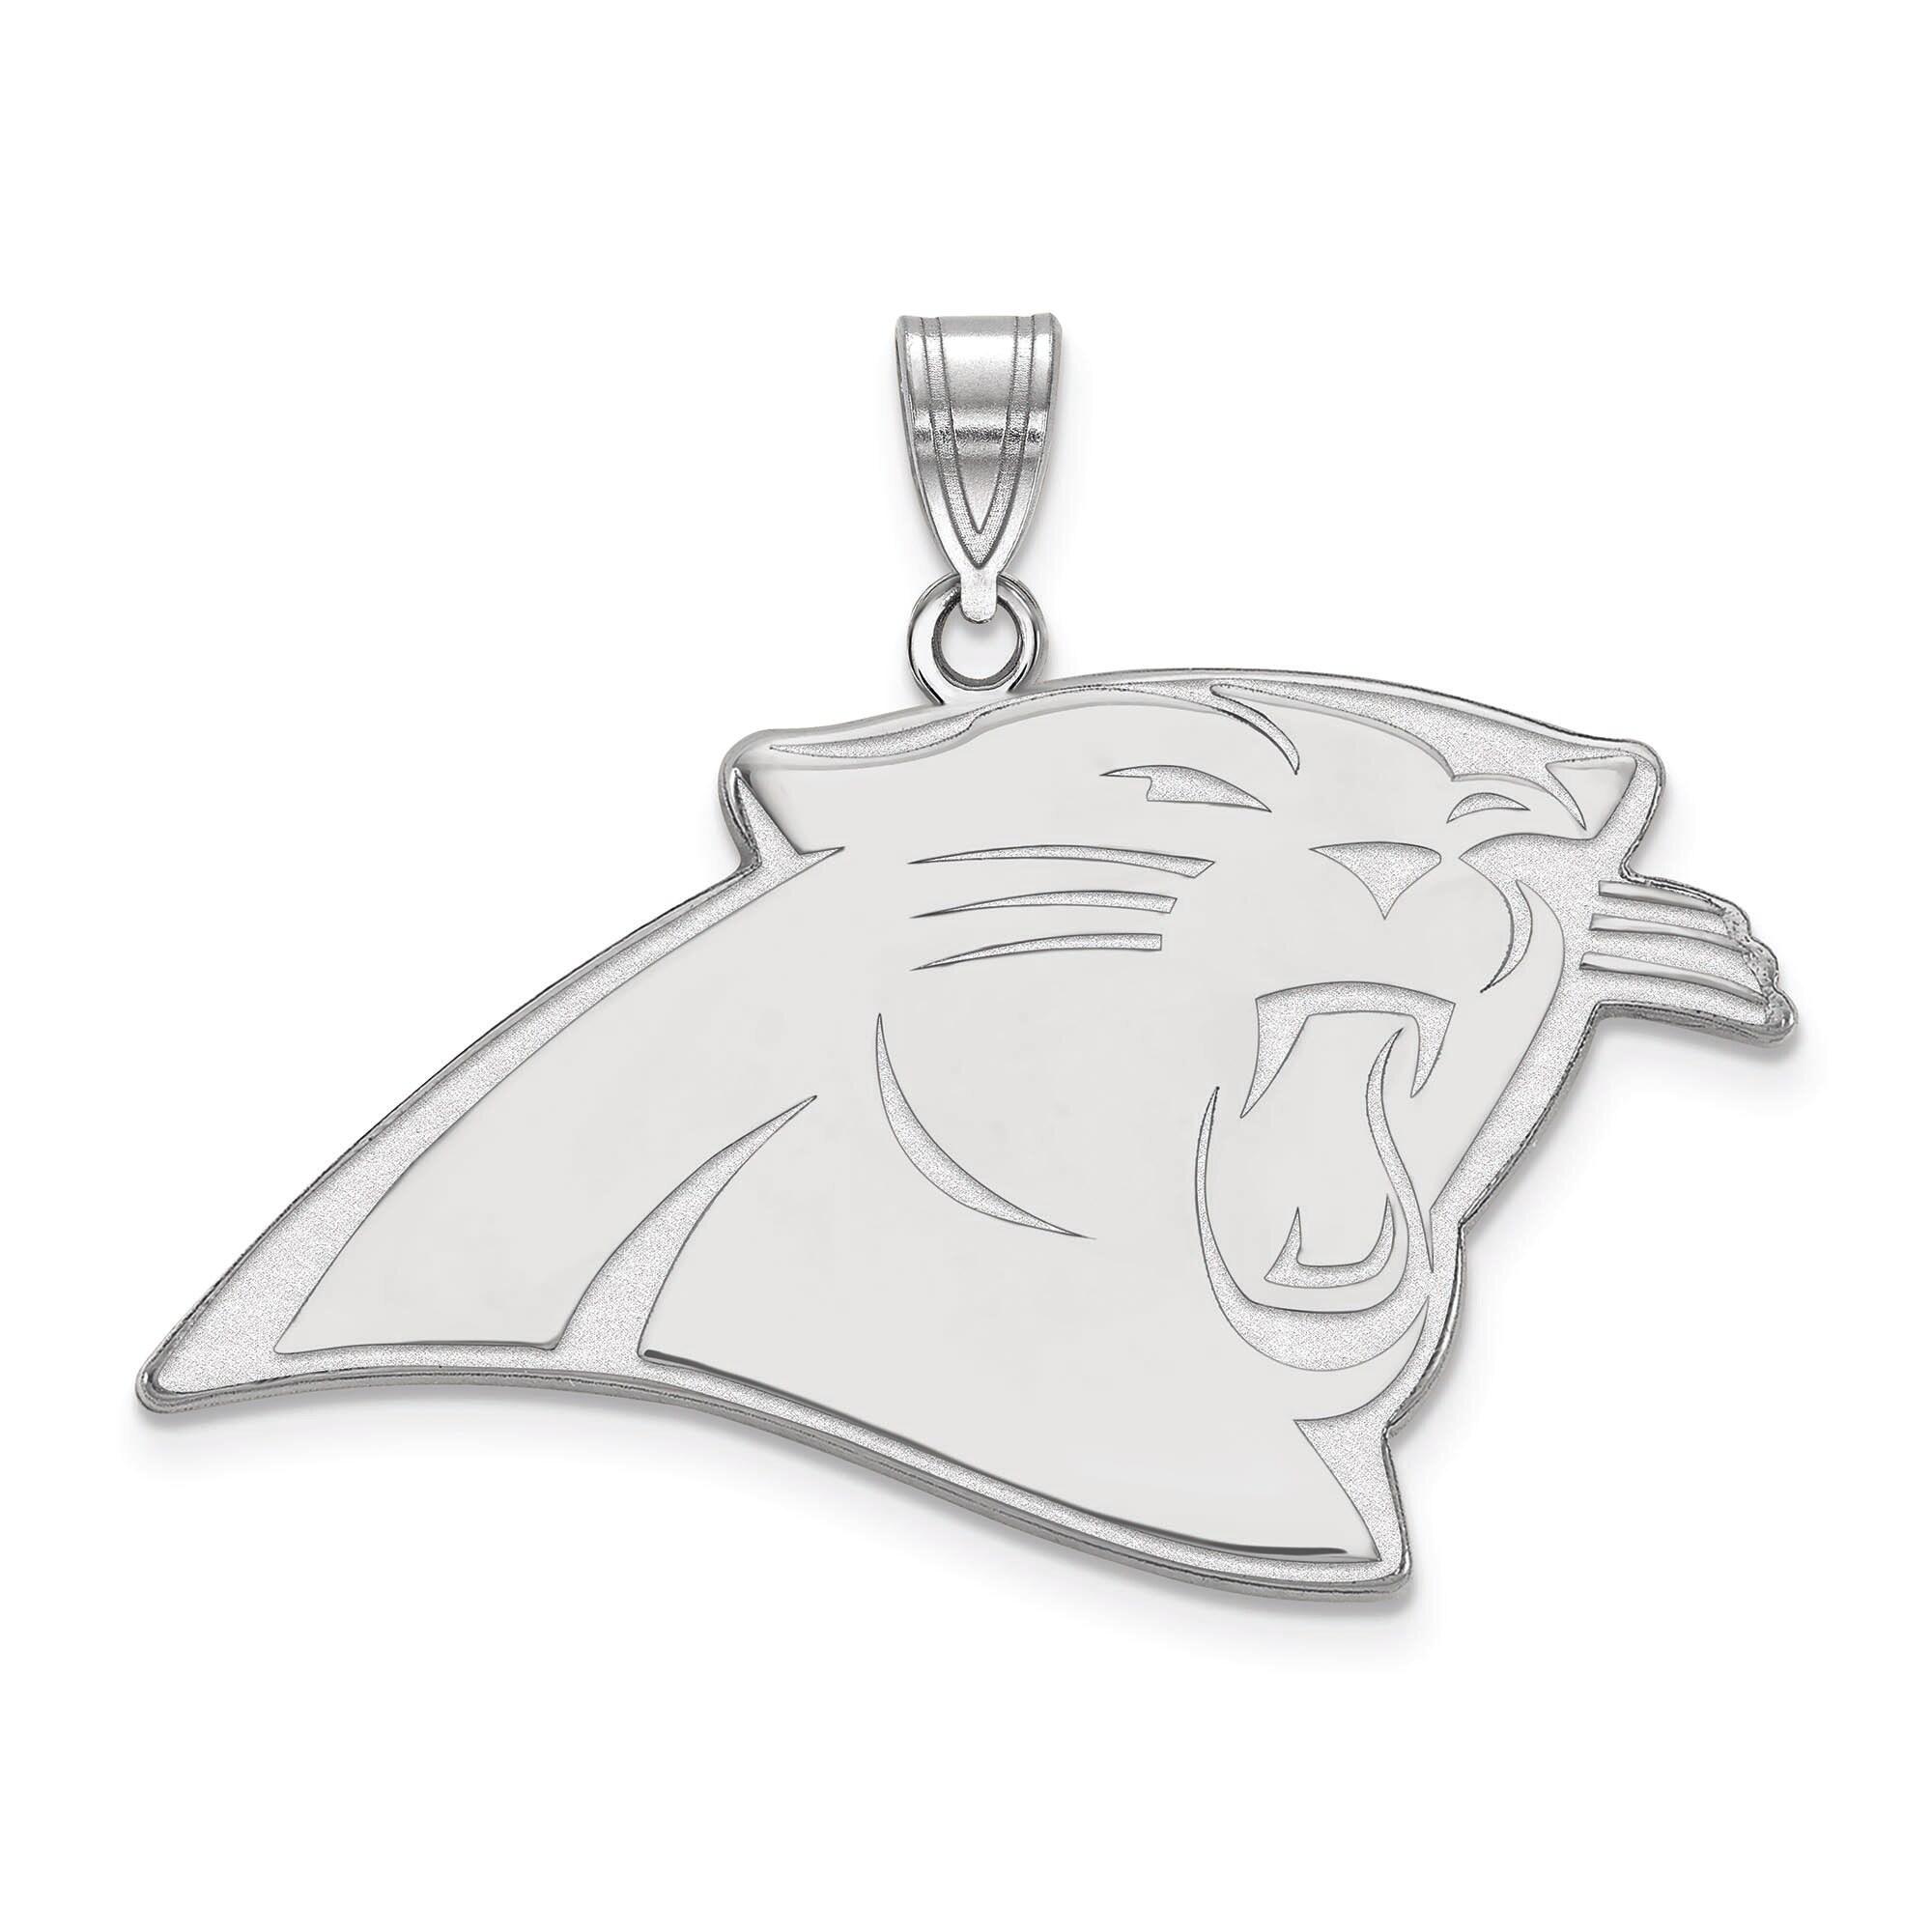 Carolina Panthers Women's Sterling Silver XL Pendant